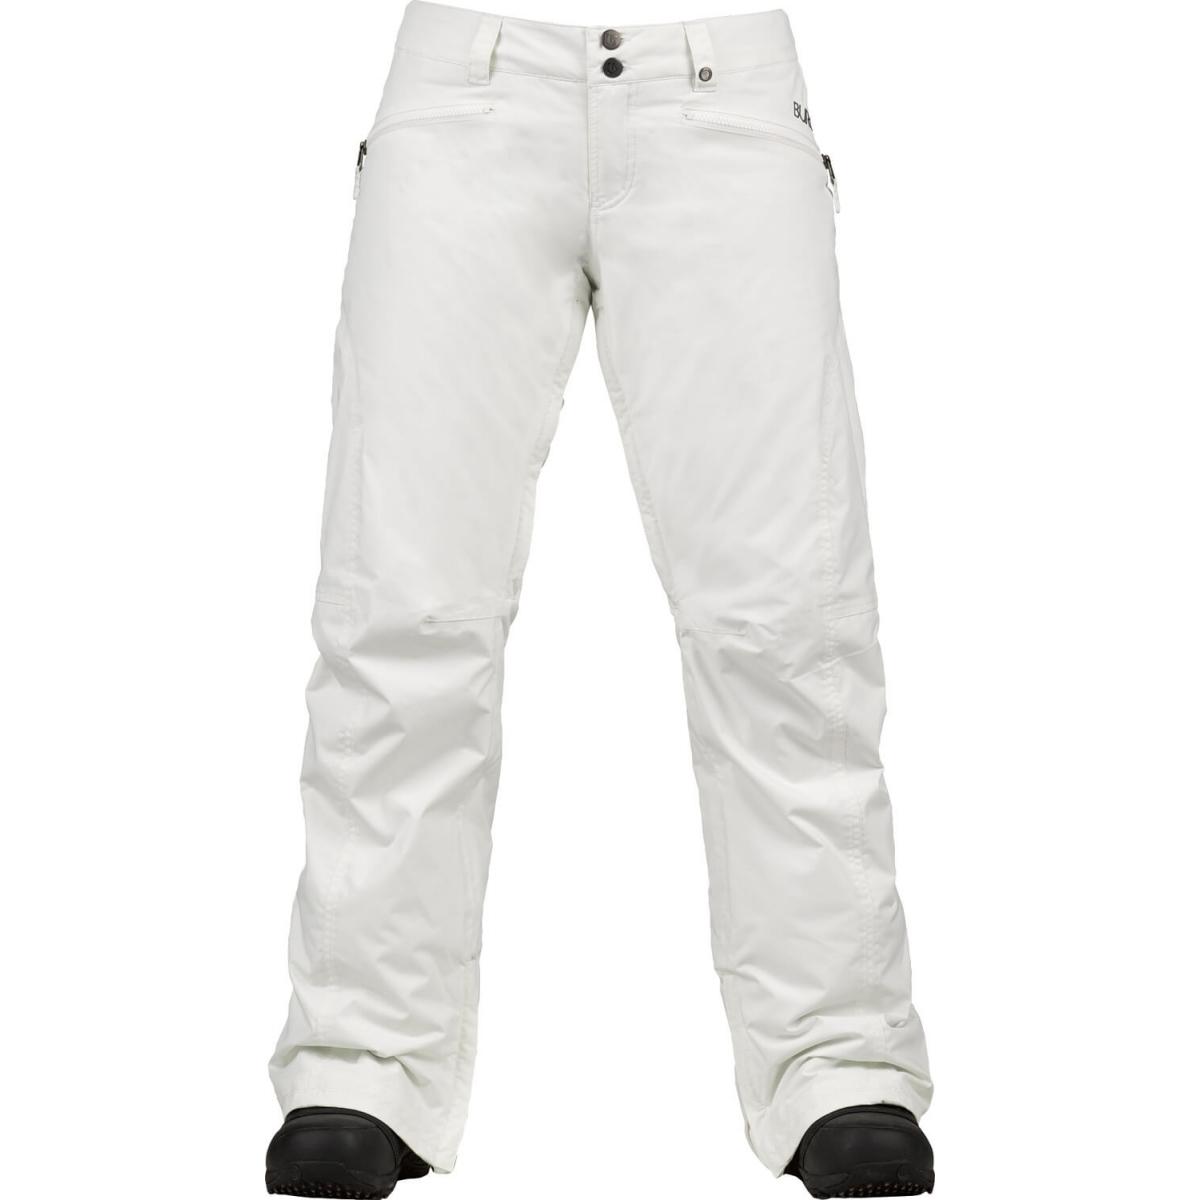 Ski White Burton De Femme Pt Fly Pantalon Fr Stout Wb trsdQh